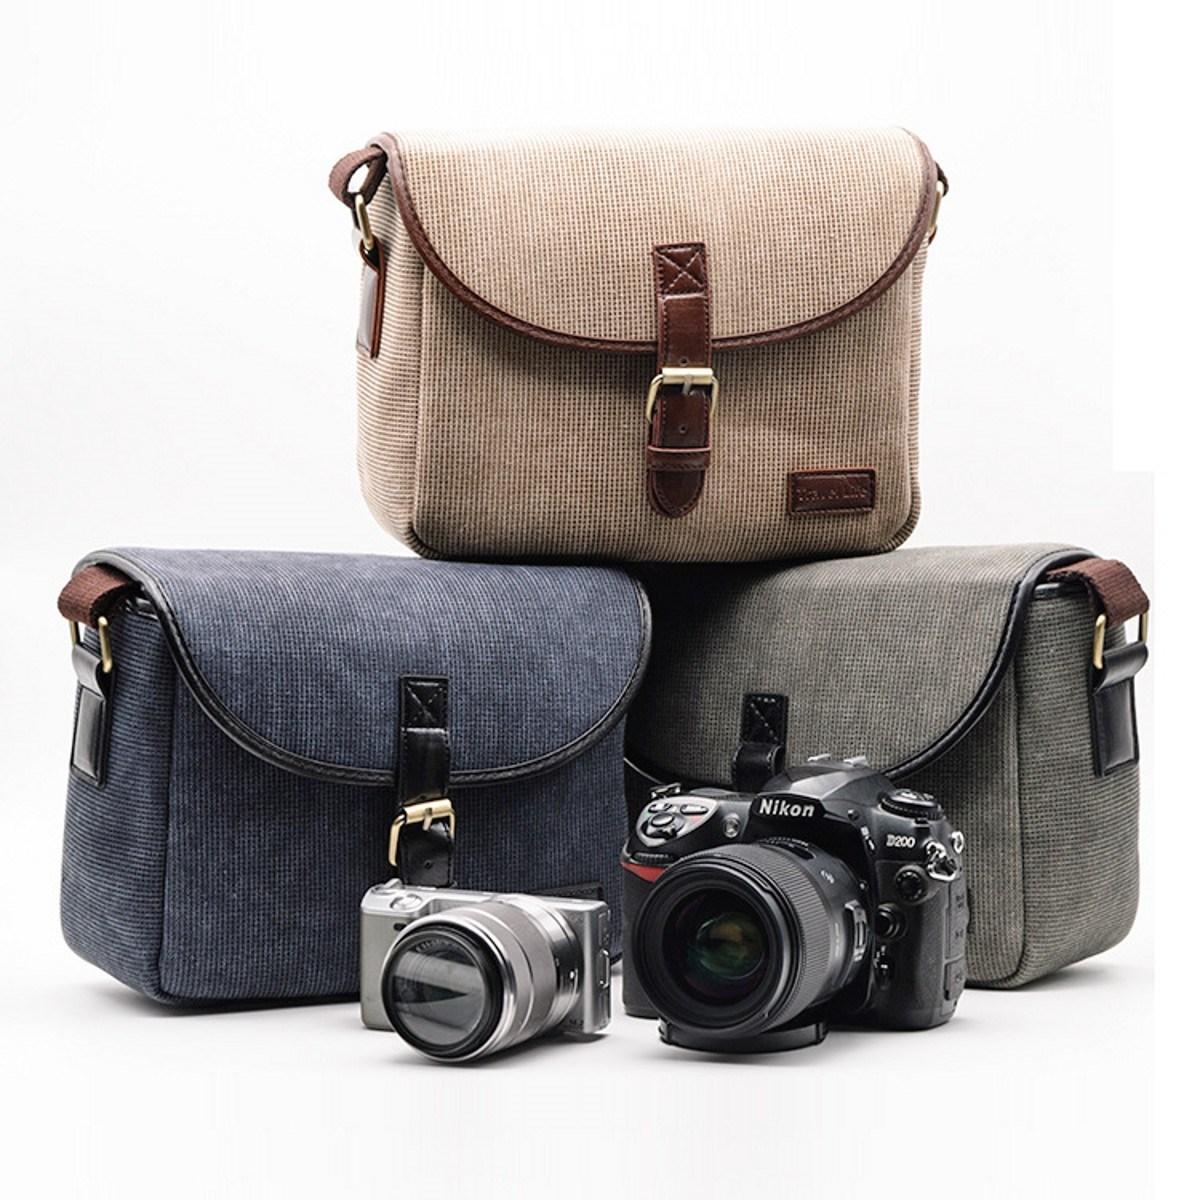 China Vintage Waterproof Oxford Teens School Sling Insert Dslr Camera Bag China Camera Bag Backpack And Camera Bags Price